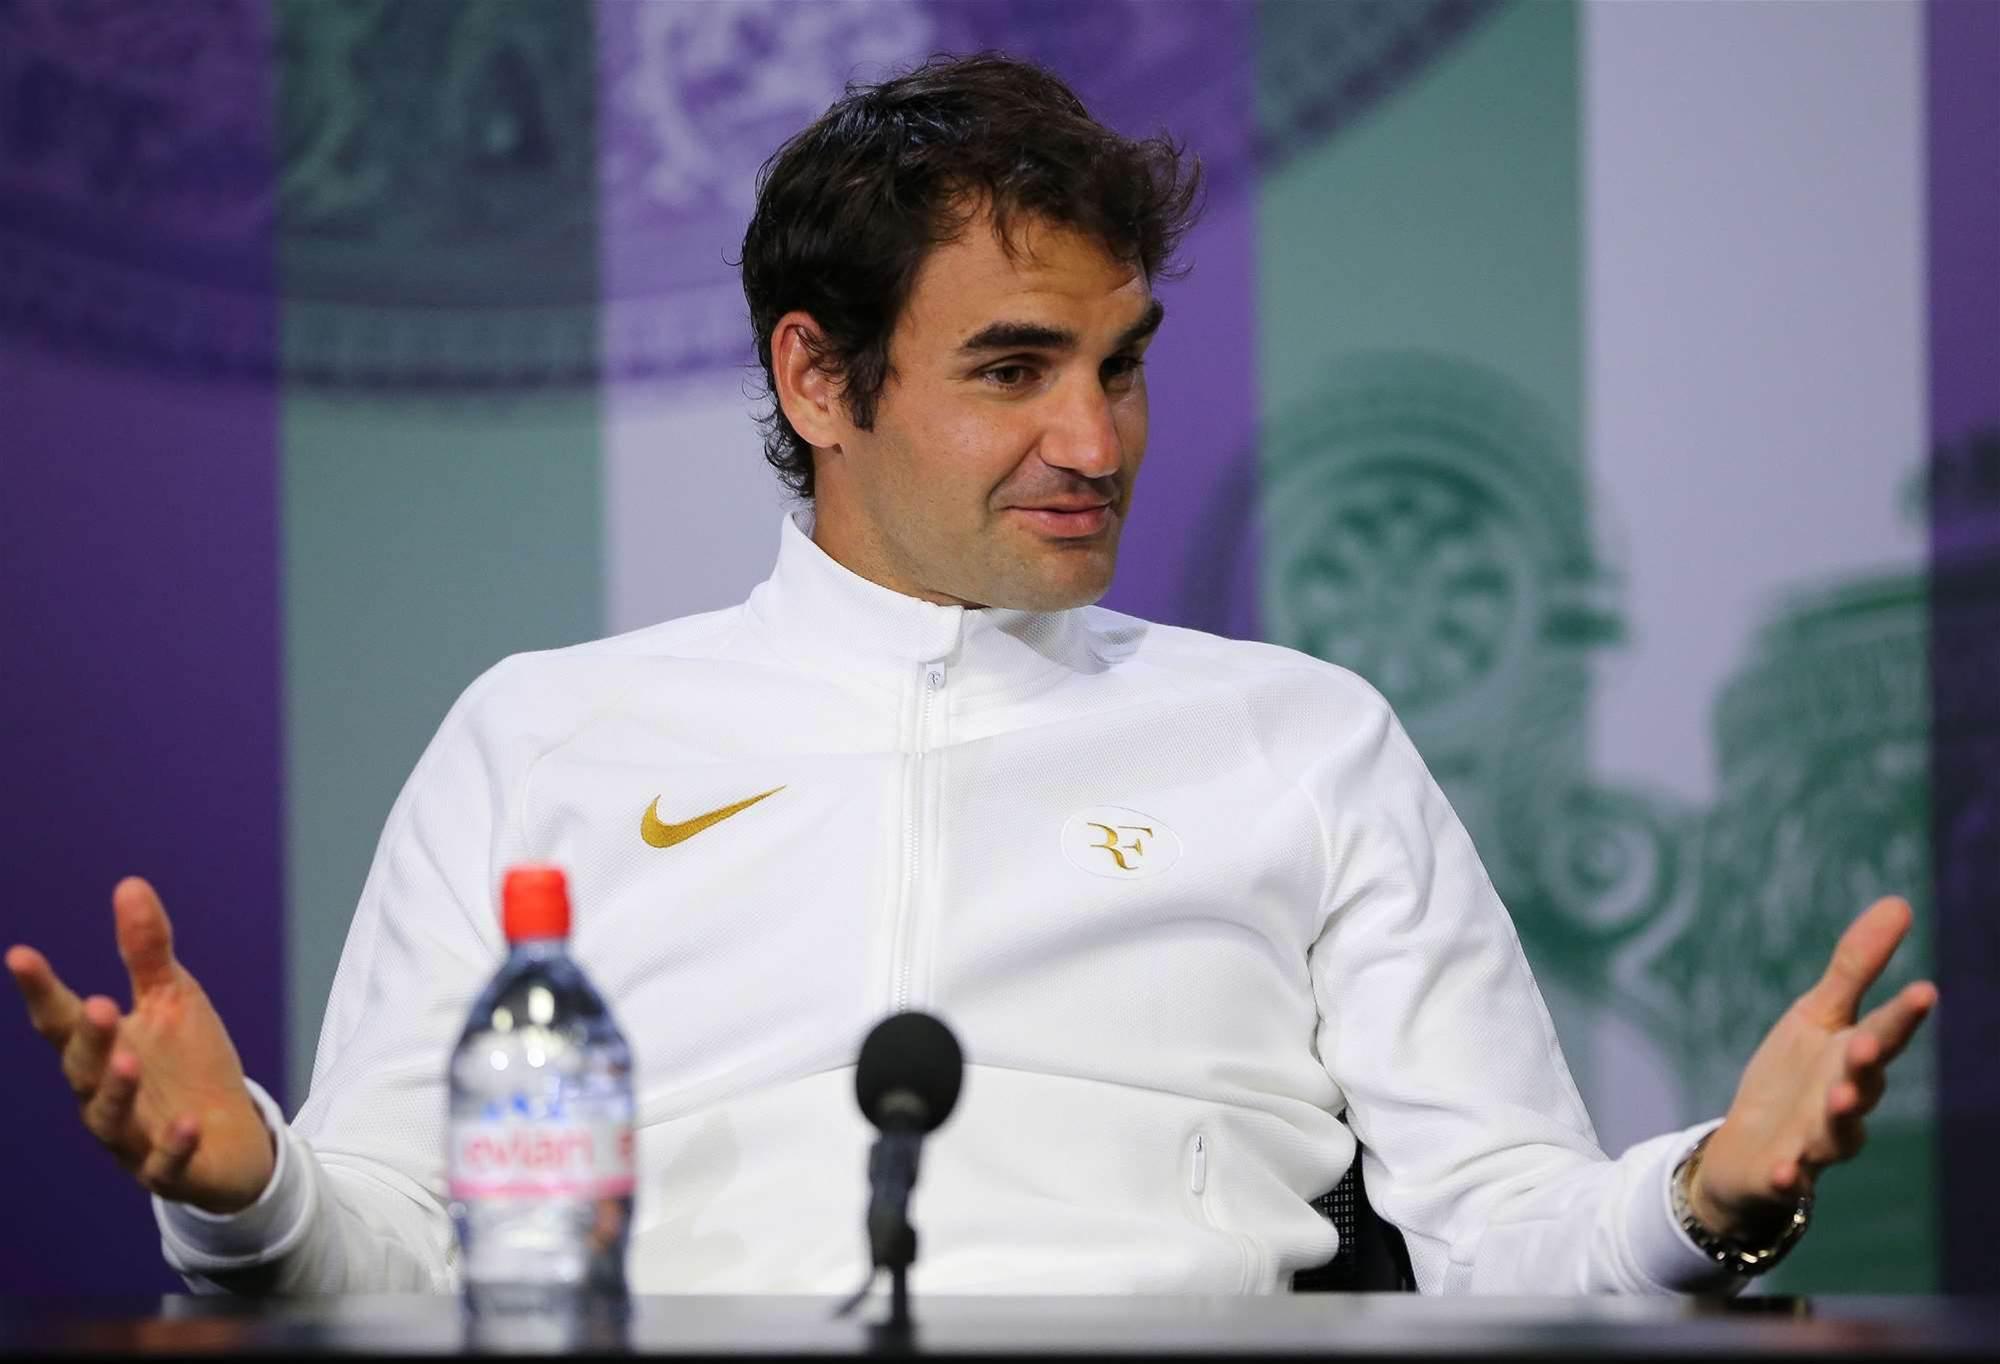 Federer's still a champion